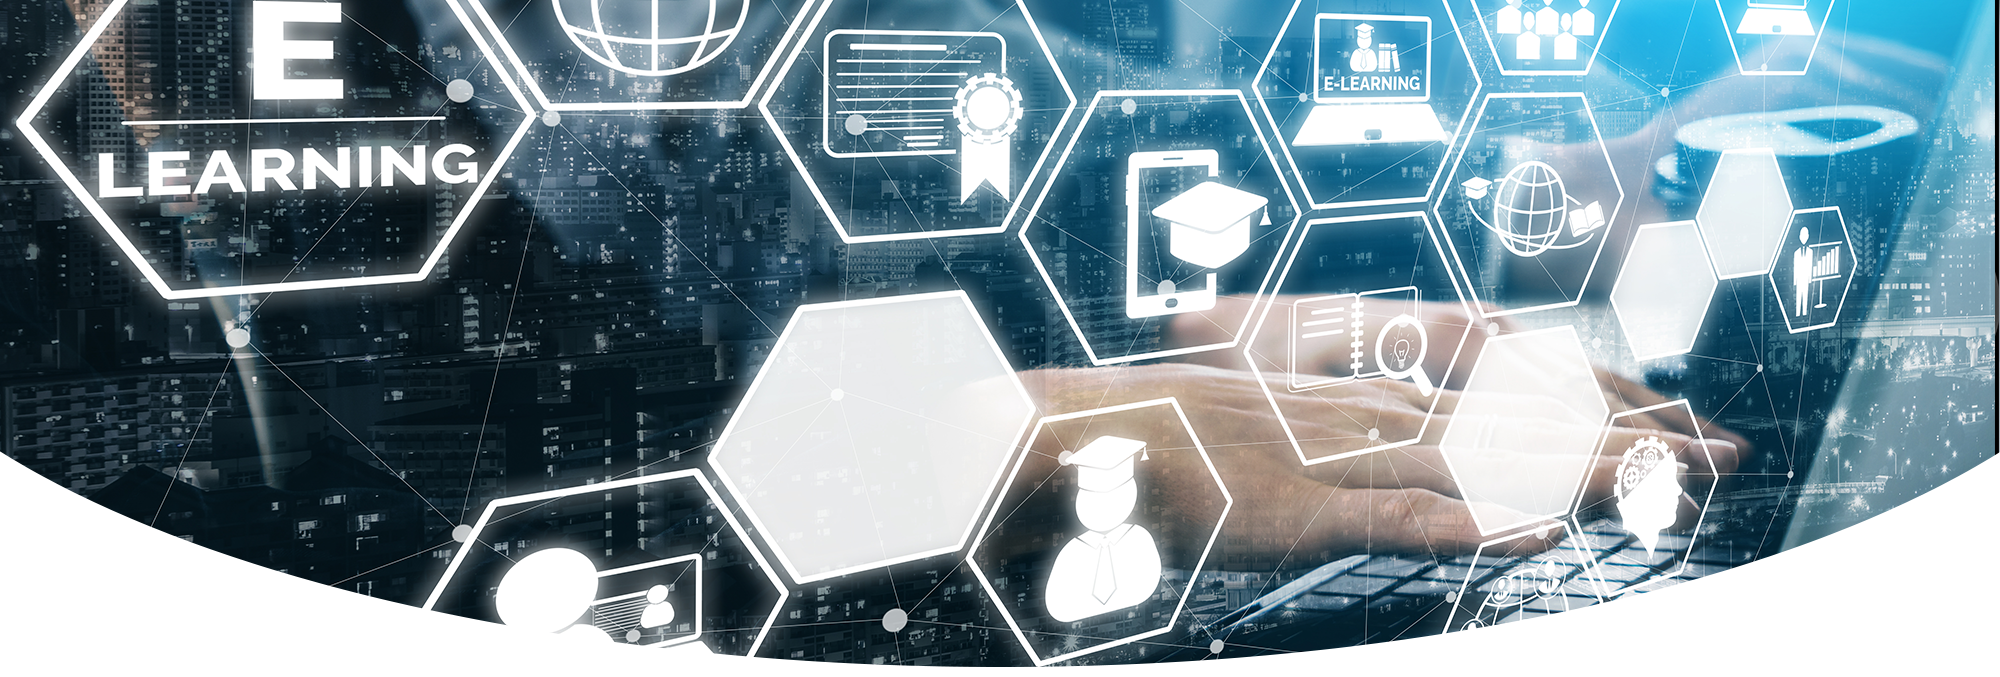 iDesign | News | Learning Engineers Inch Toward the Spotlight